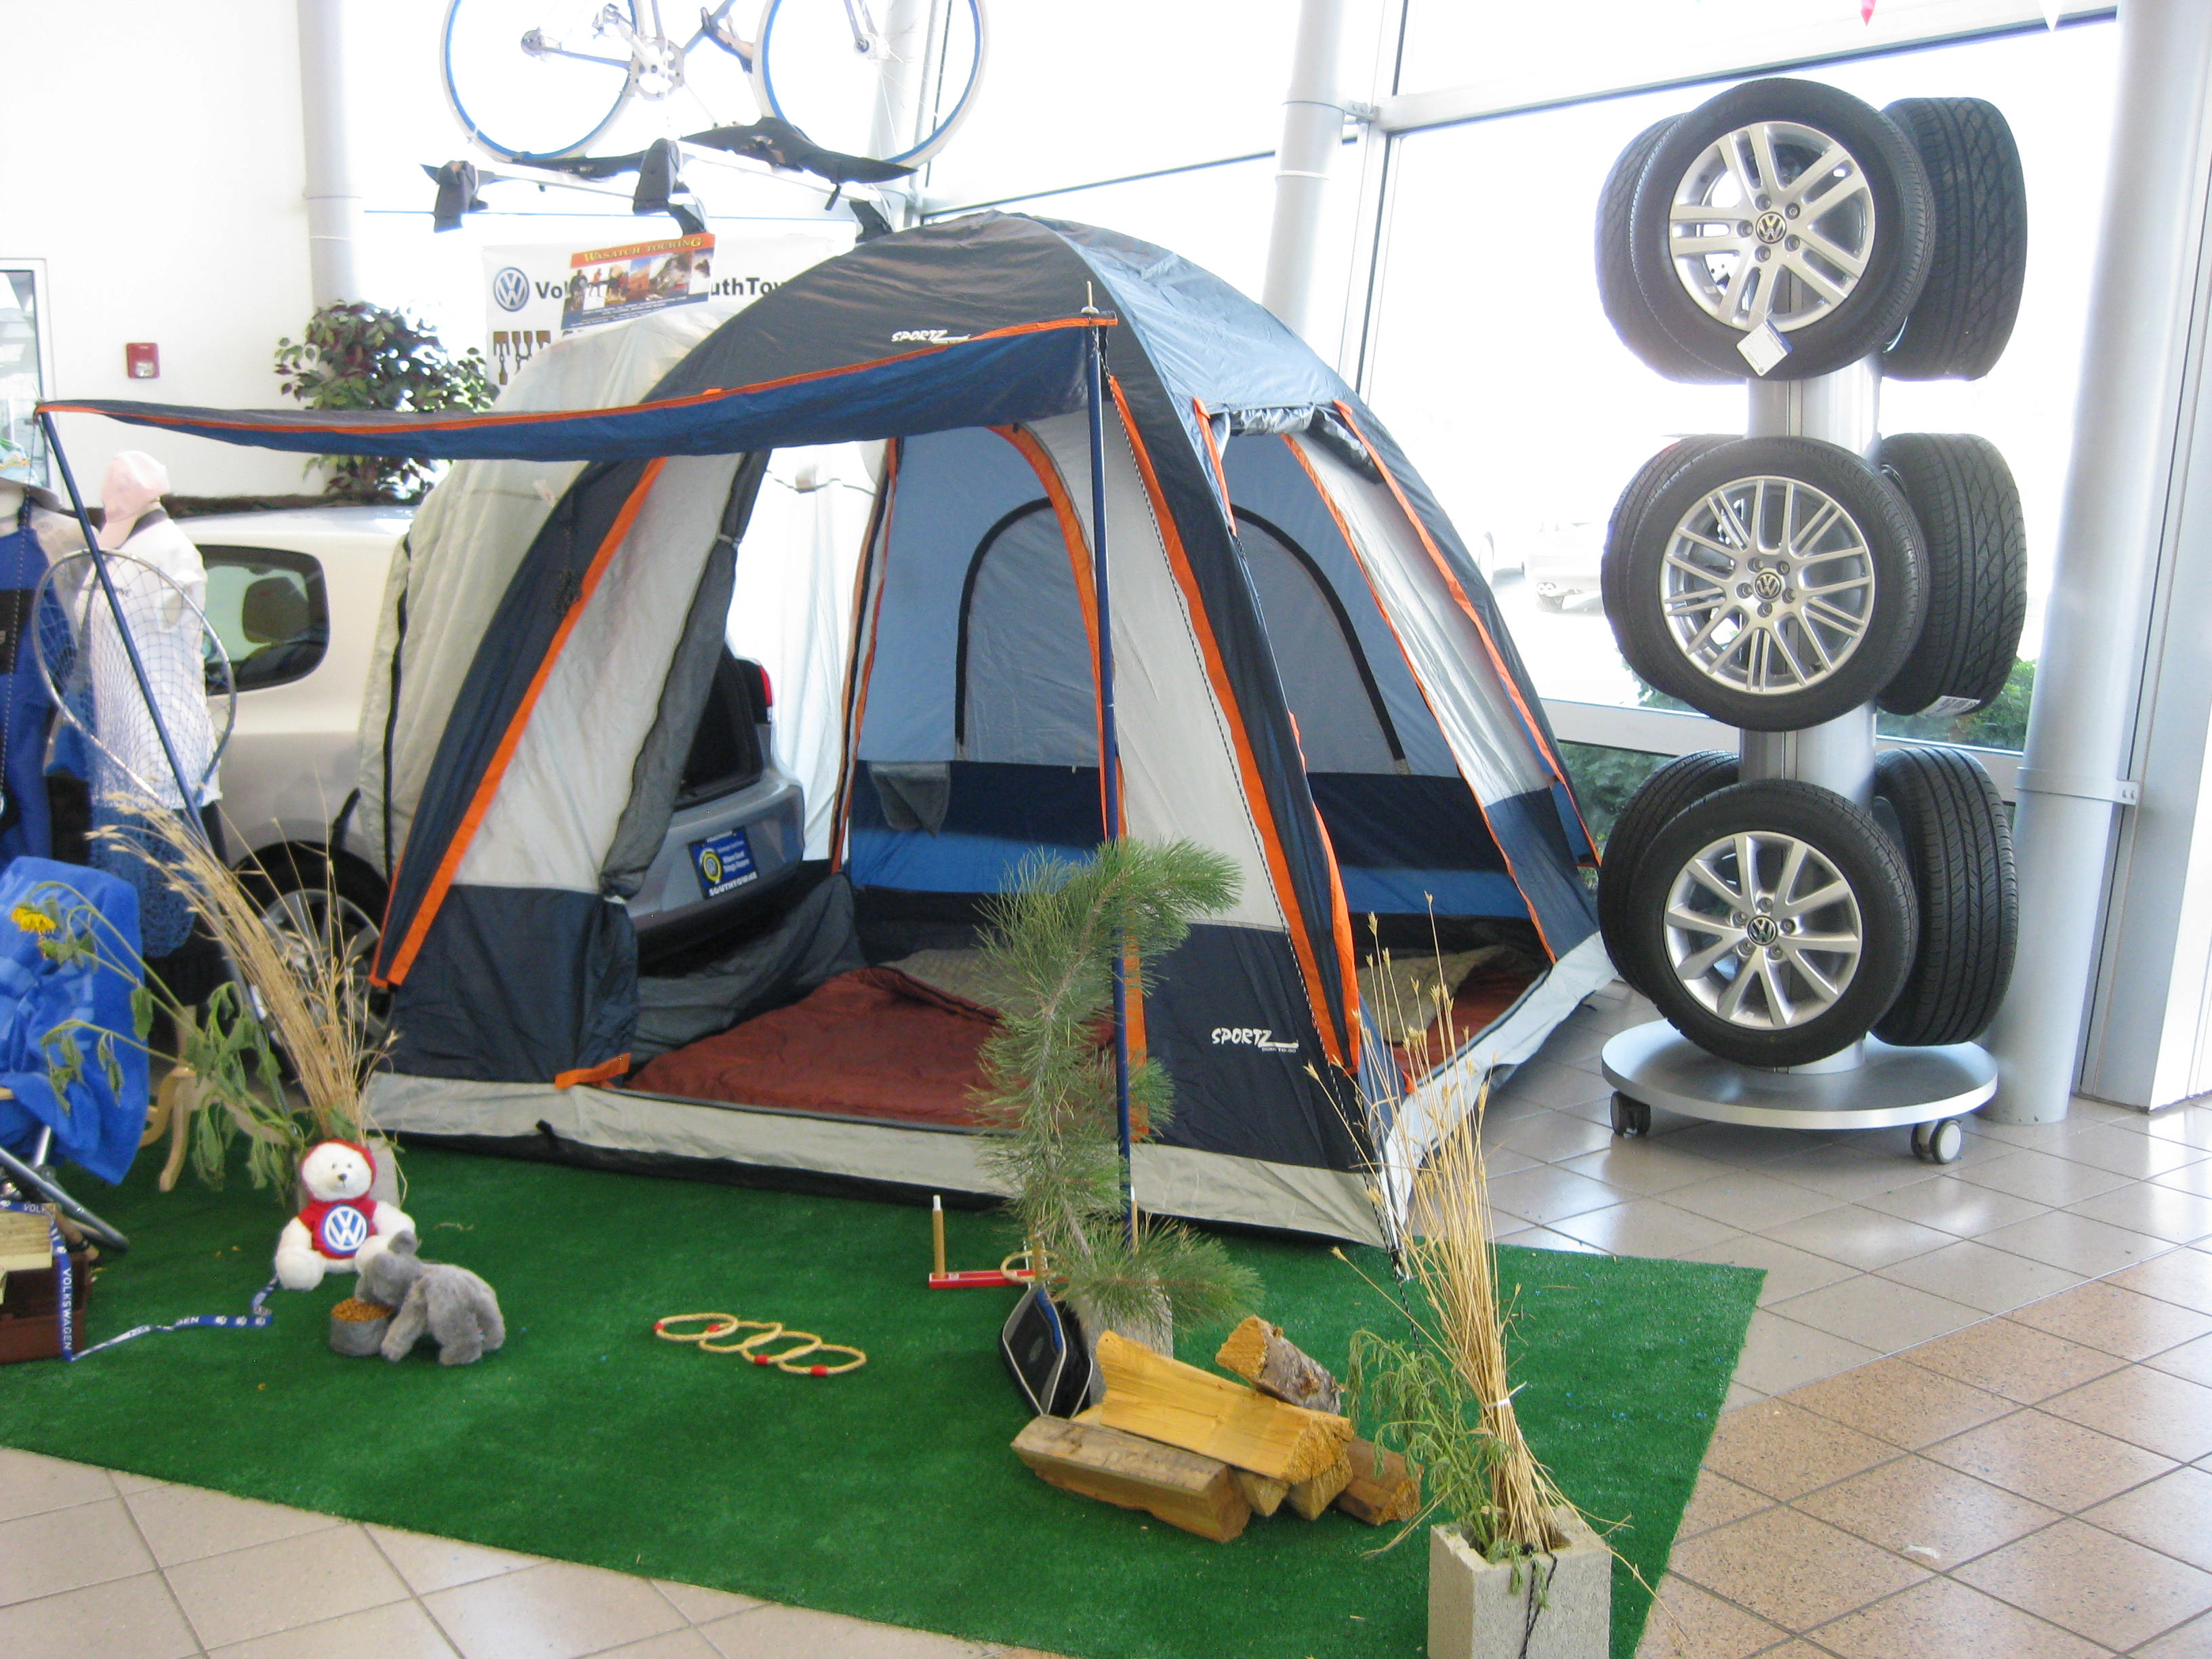 Parts | Volkswagen SouthTowne